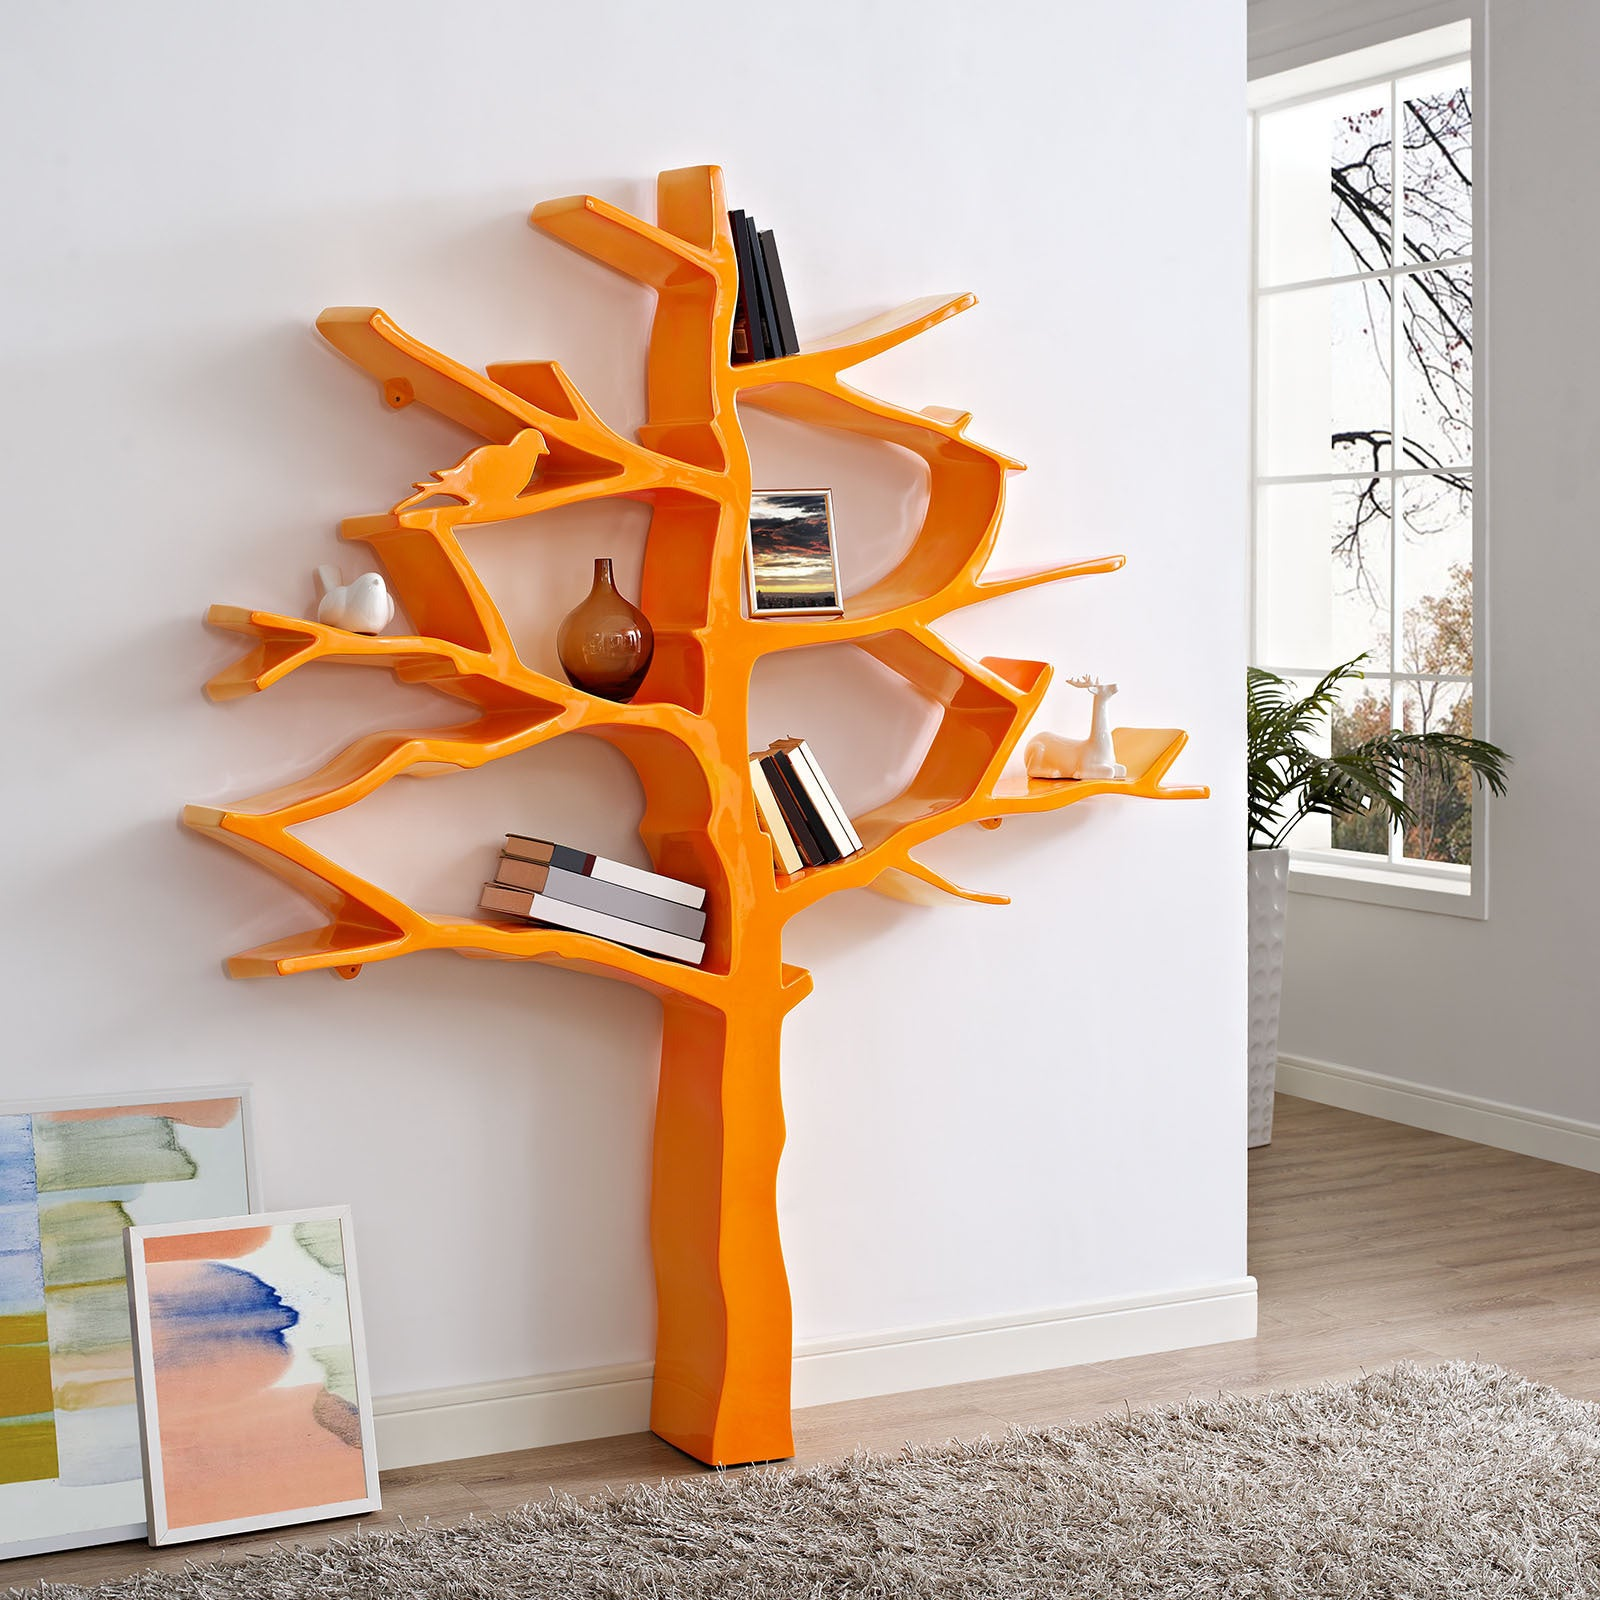 shelving living furniture bookcase wooden display bookcases orange rack tier shelf beech home storage room